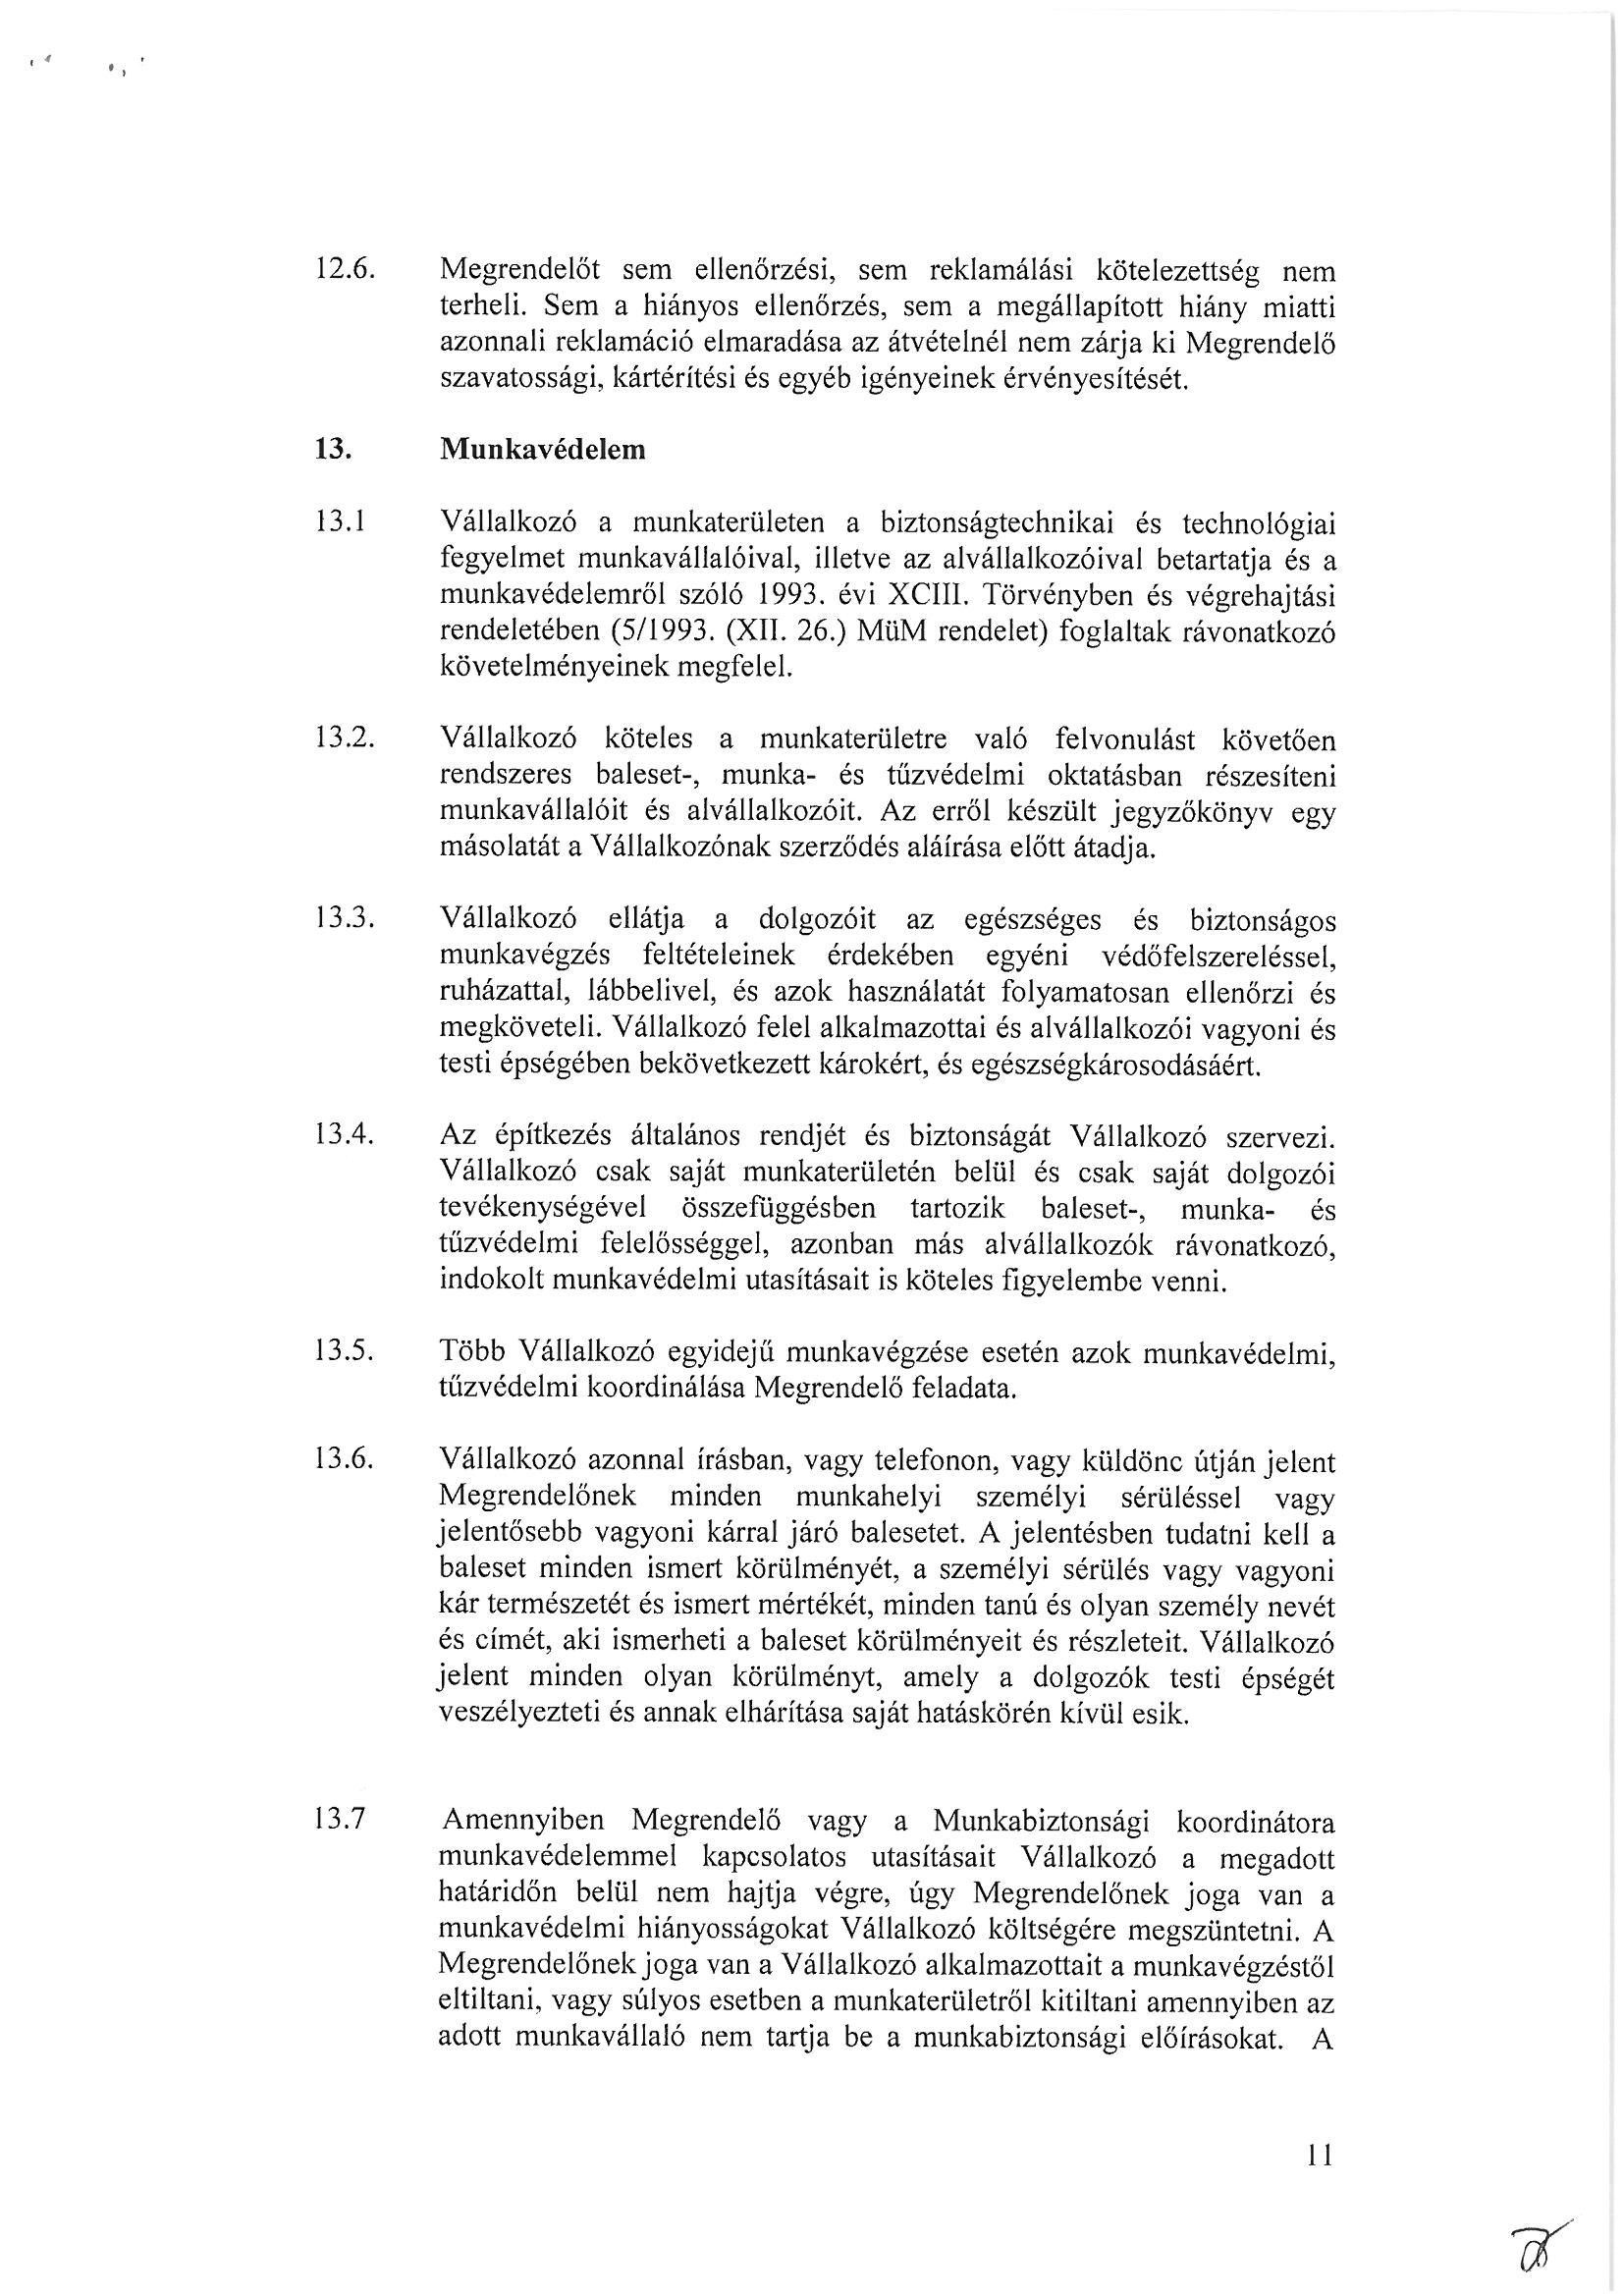 SZ_11